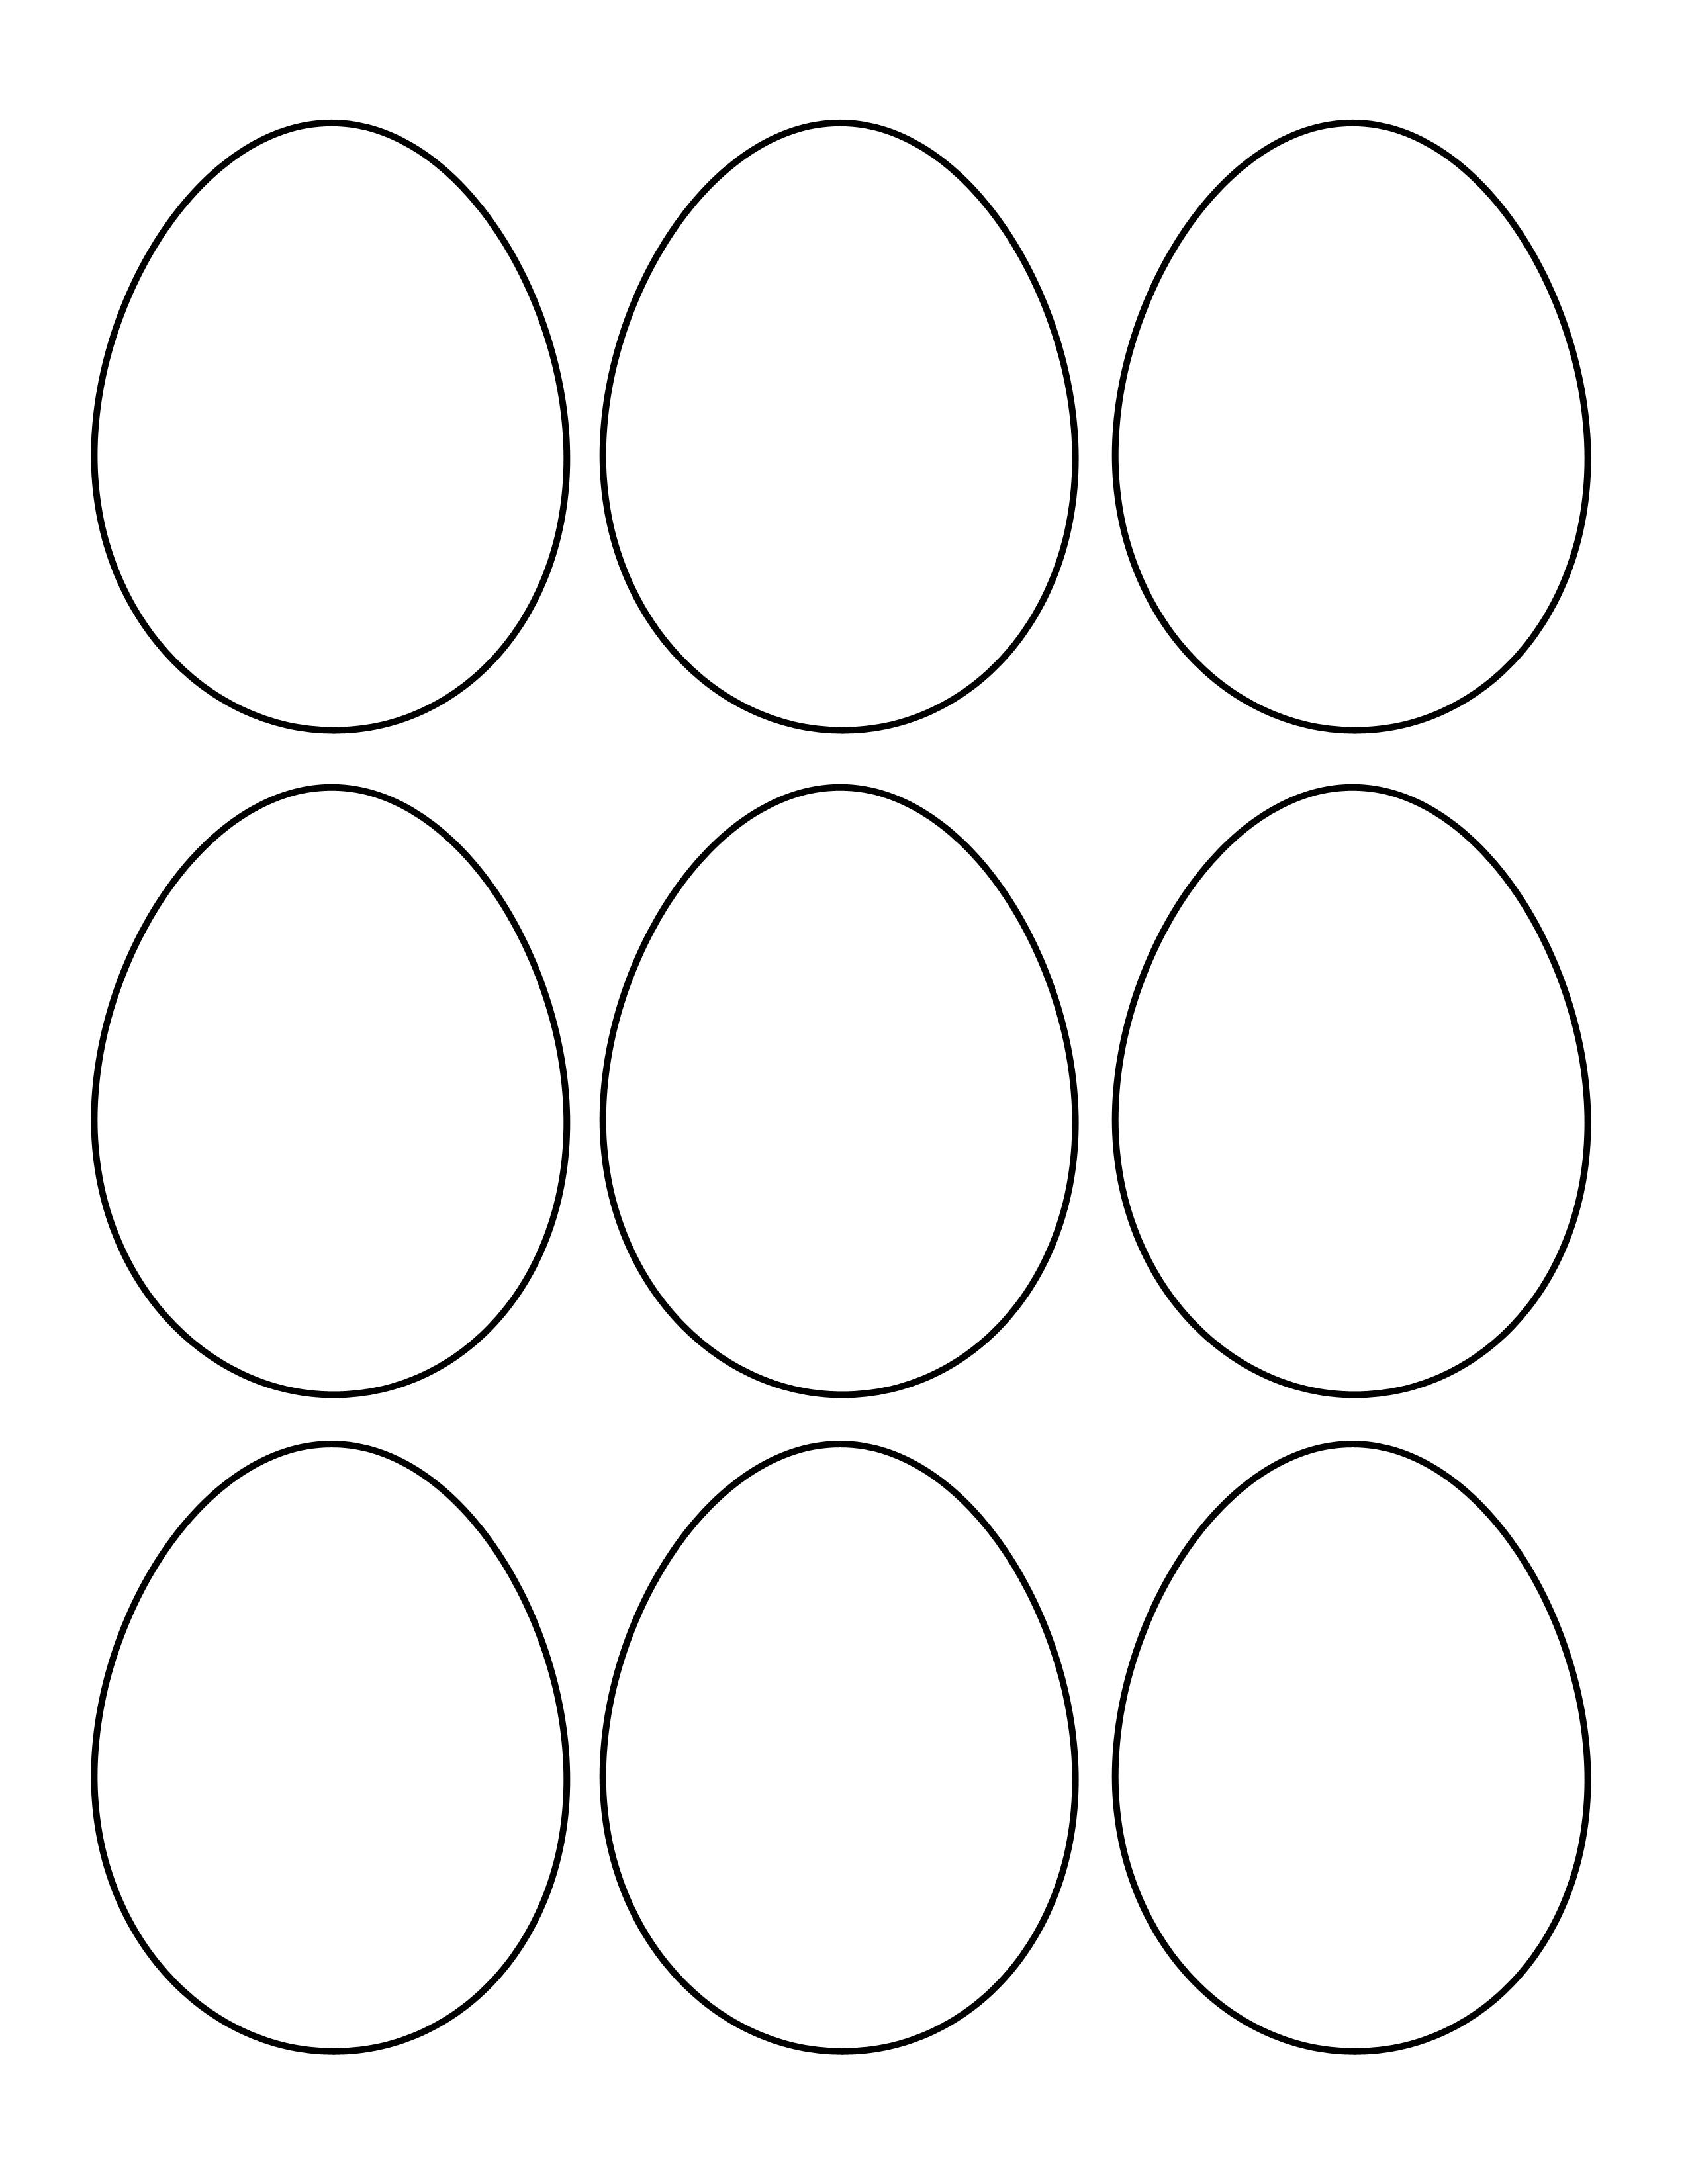 Easter Egg Shapes Templates | Easter | Easter Egg Template, Easter - Easter Egg Template Free Printable